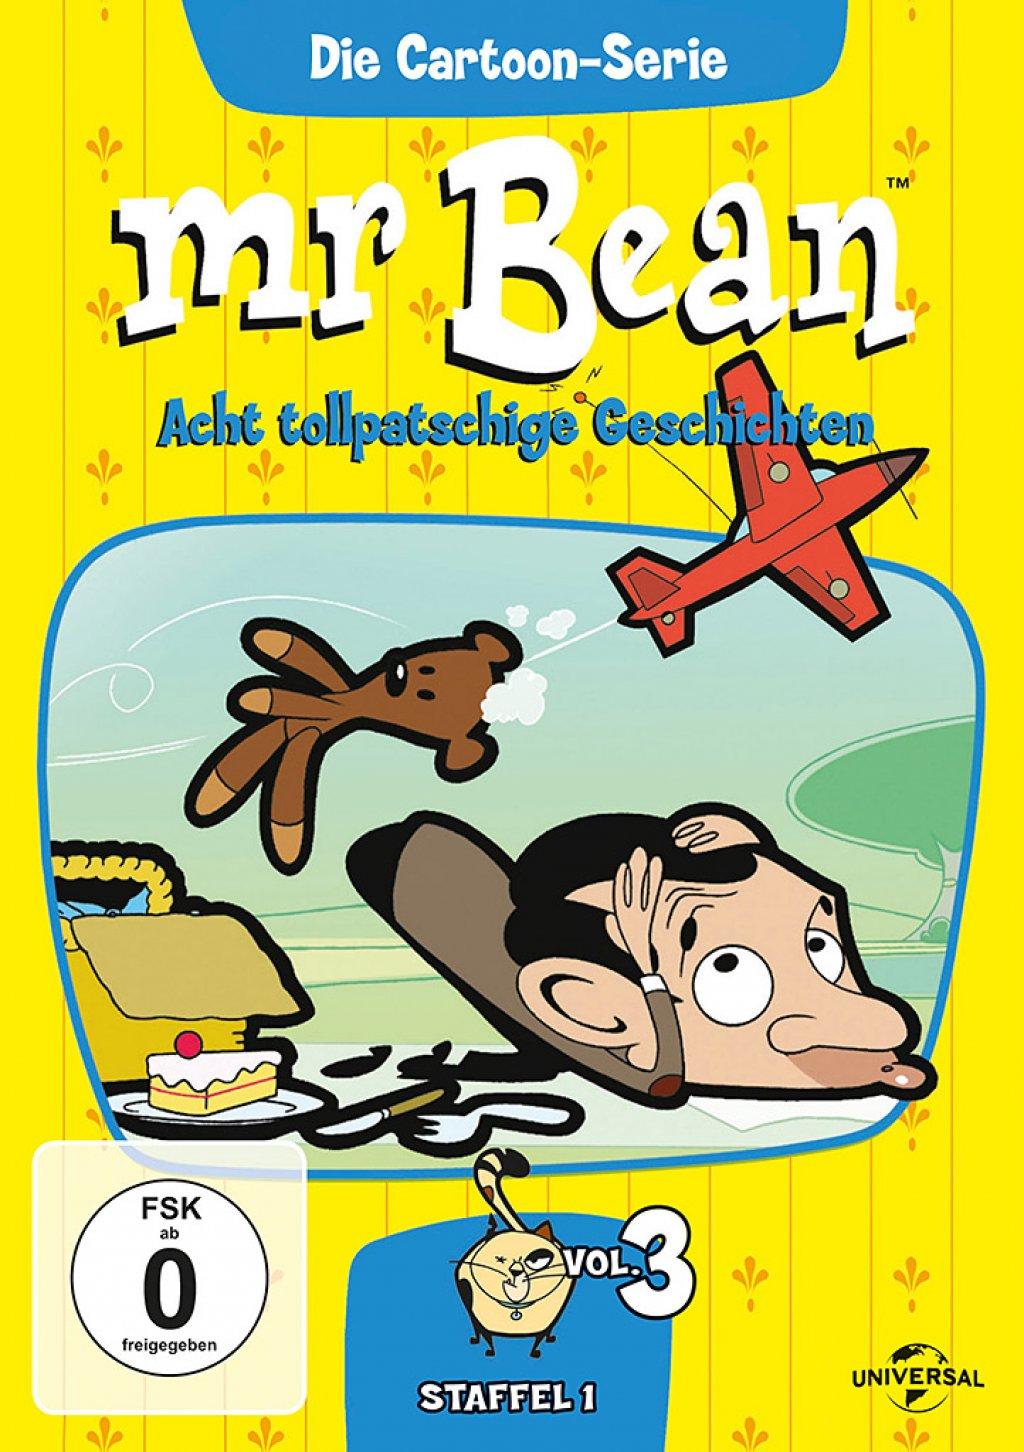 Mr. Bean - Die Cartoon Serie - Staffel 1 / Vol. 3 (DVD)